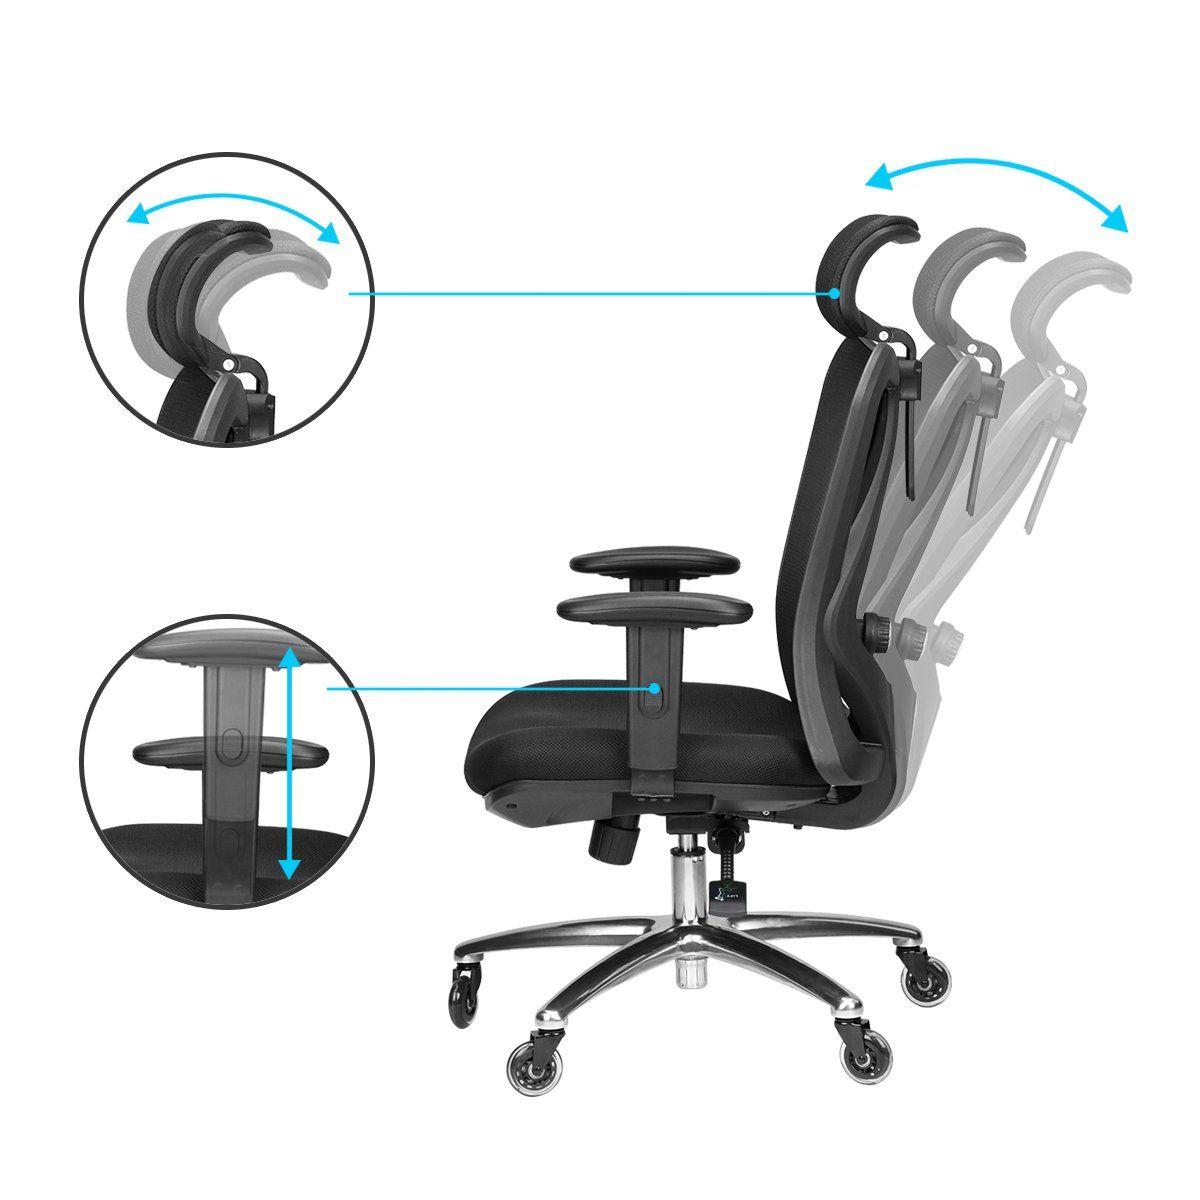 Duramont ergonomic adjustable office chair with lumbar